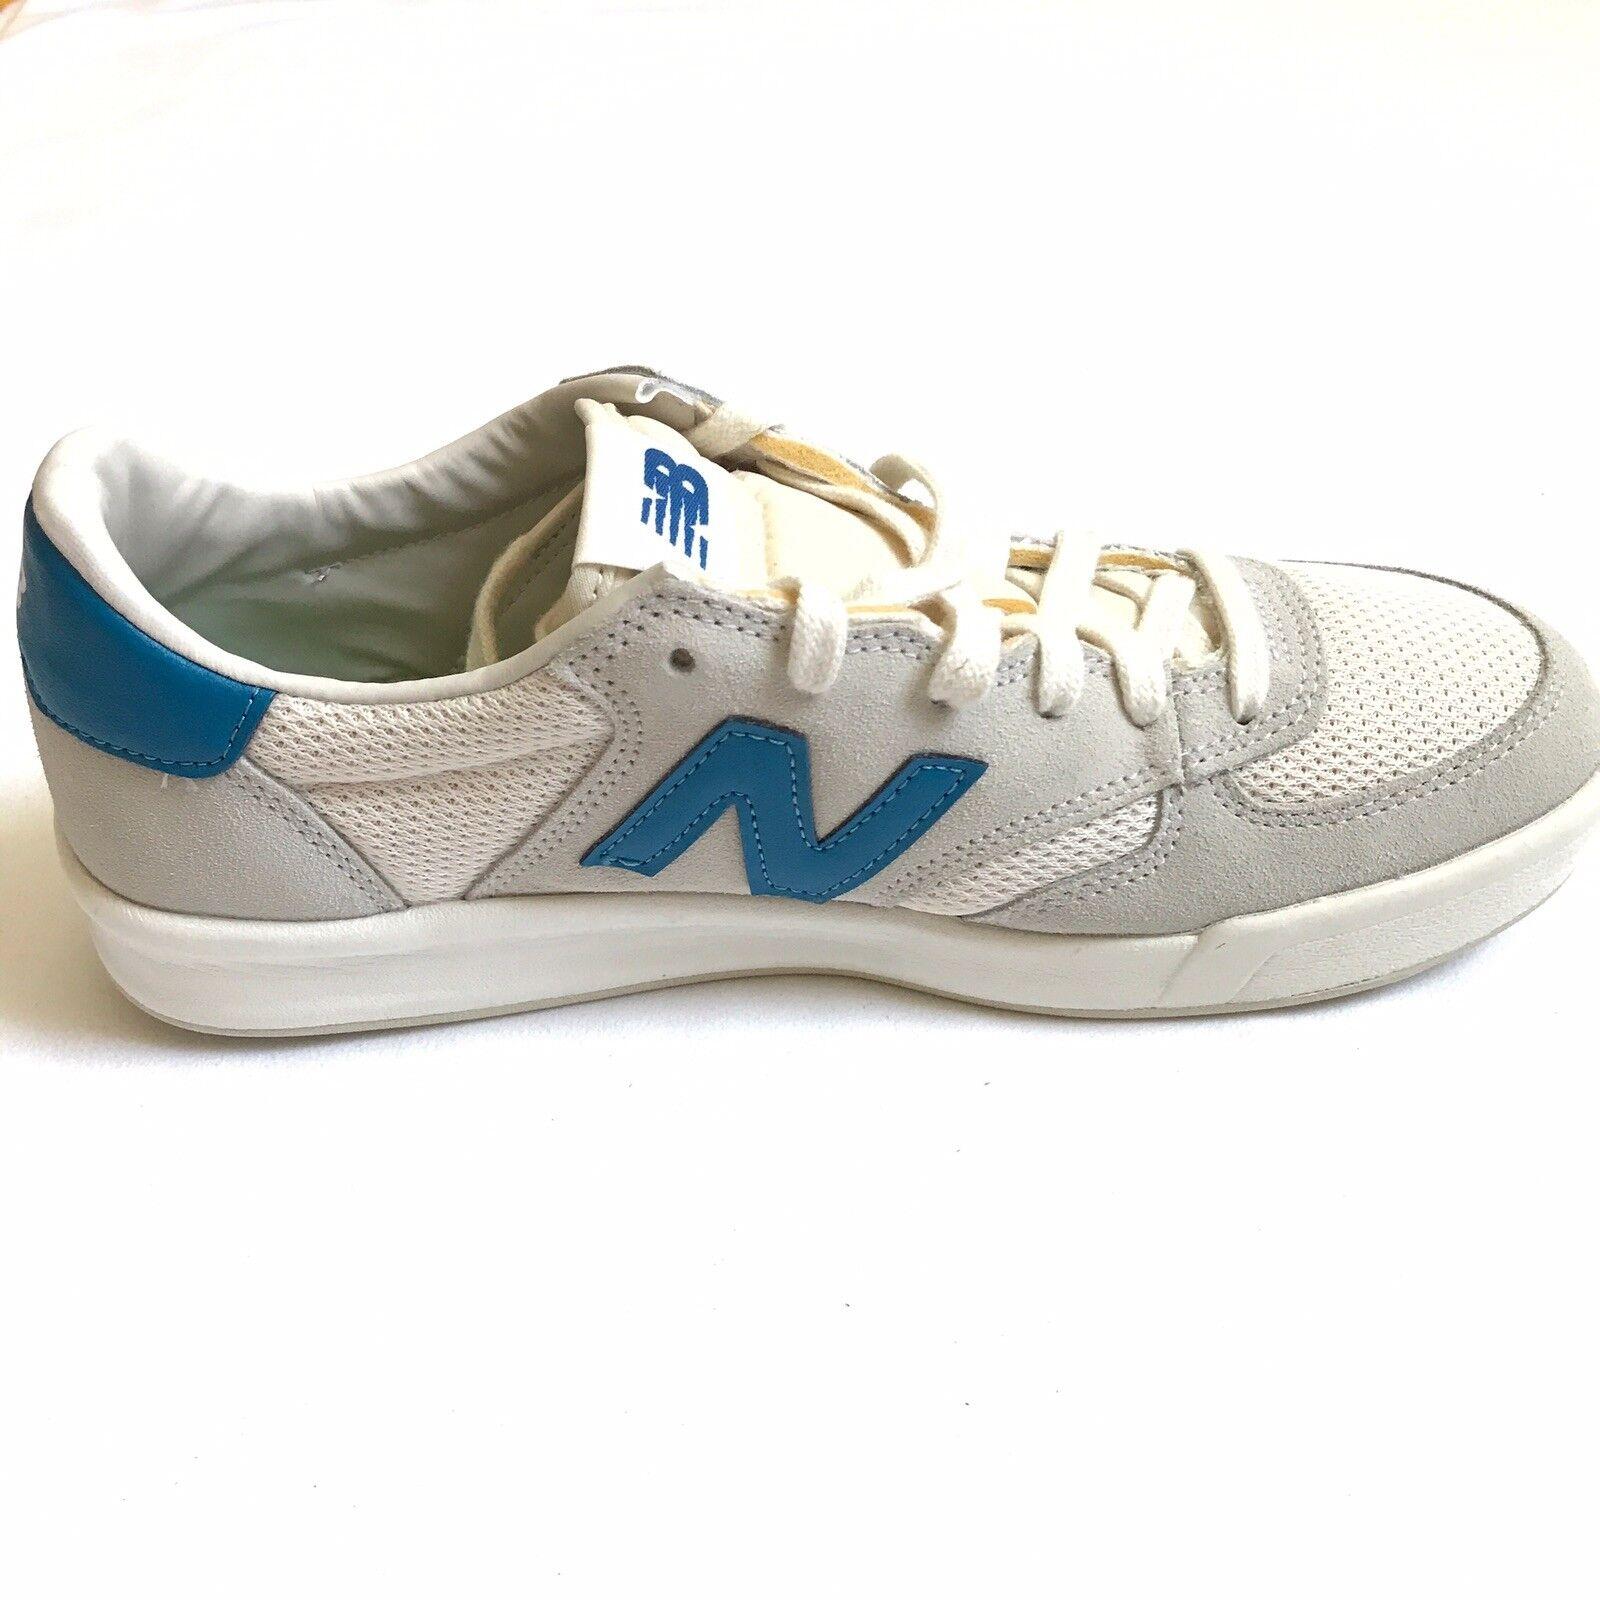 hot sale online 2faa9 34b65 NWB New New New Balance Mens 8 CRT300WB Lifestyle Mode De Vie Gray White  Sneaker